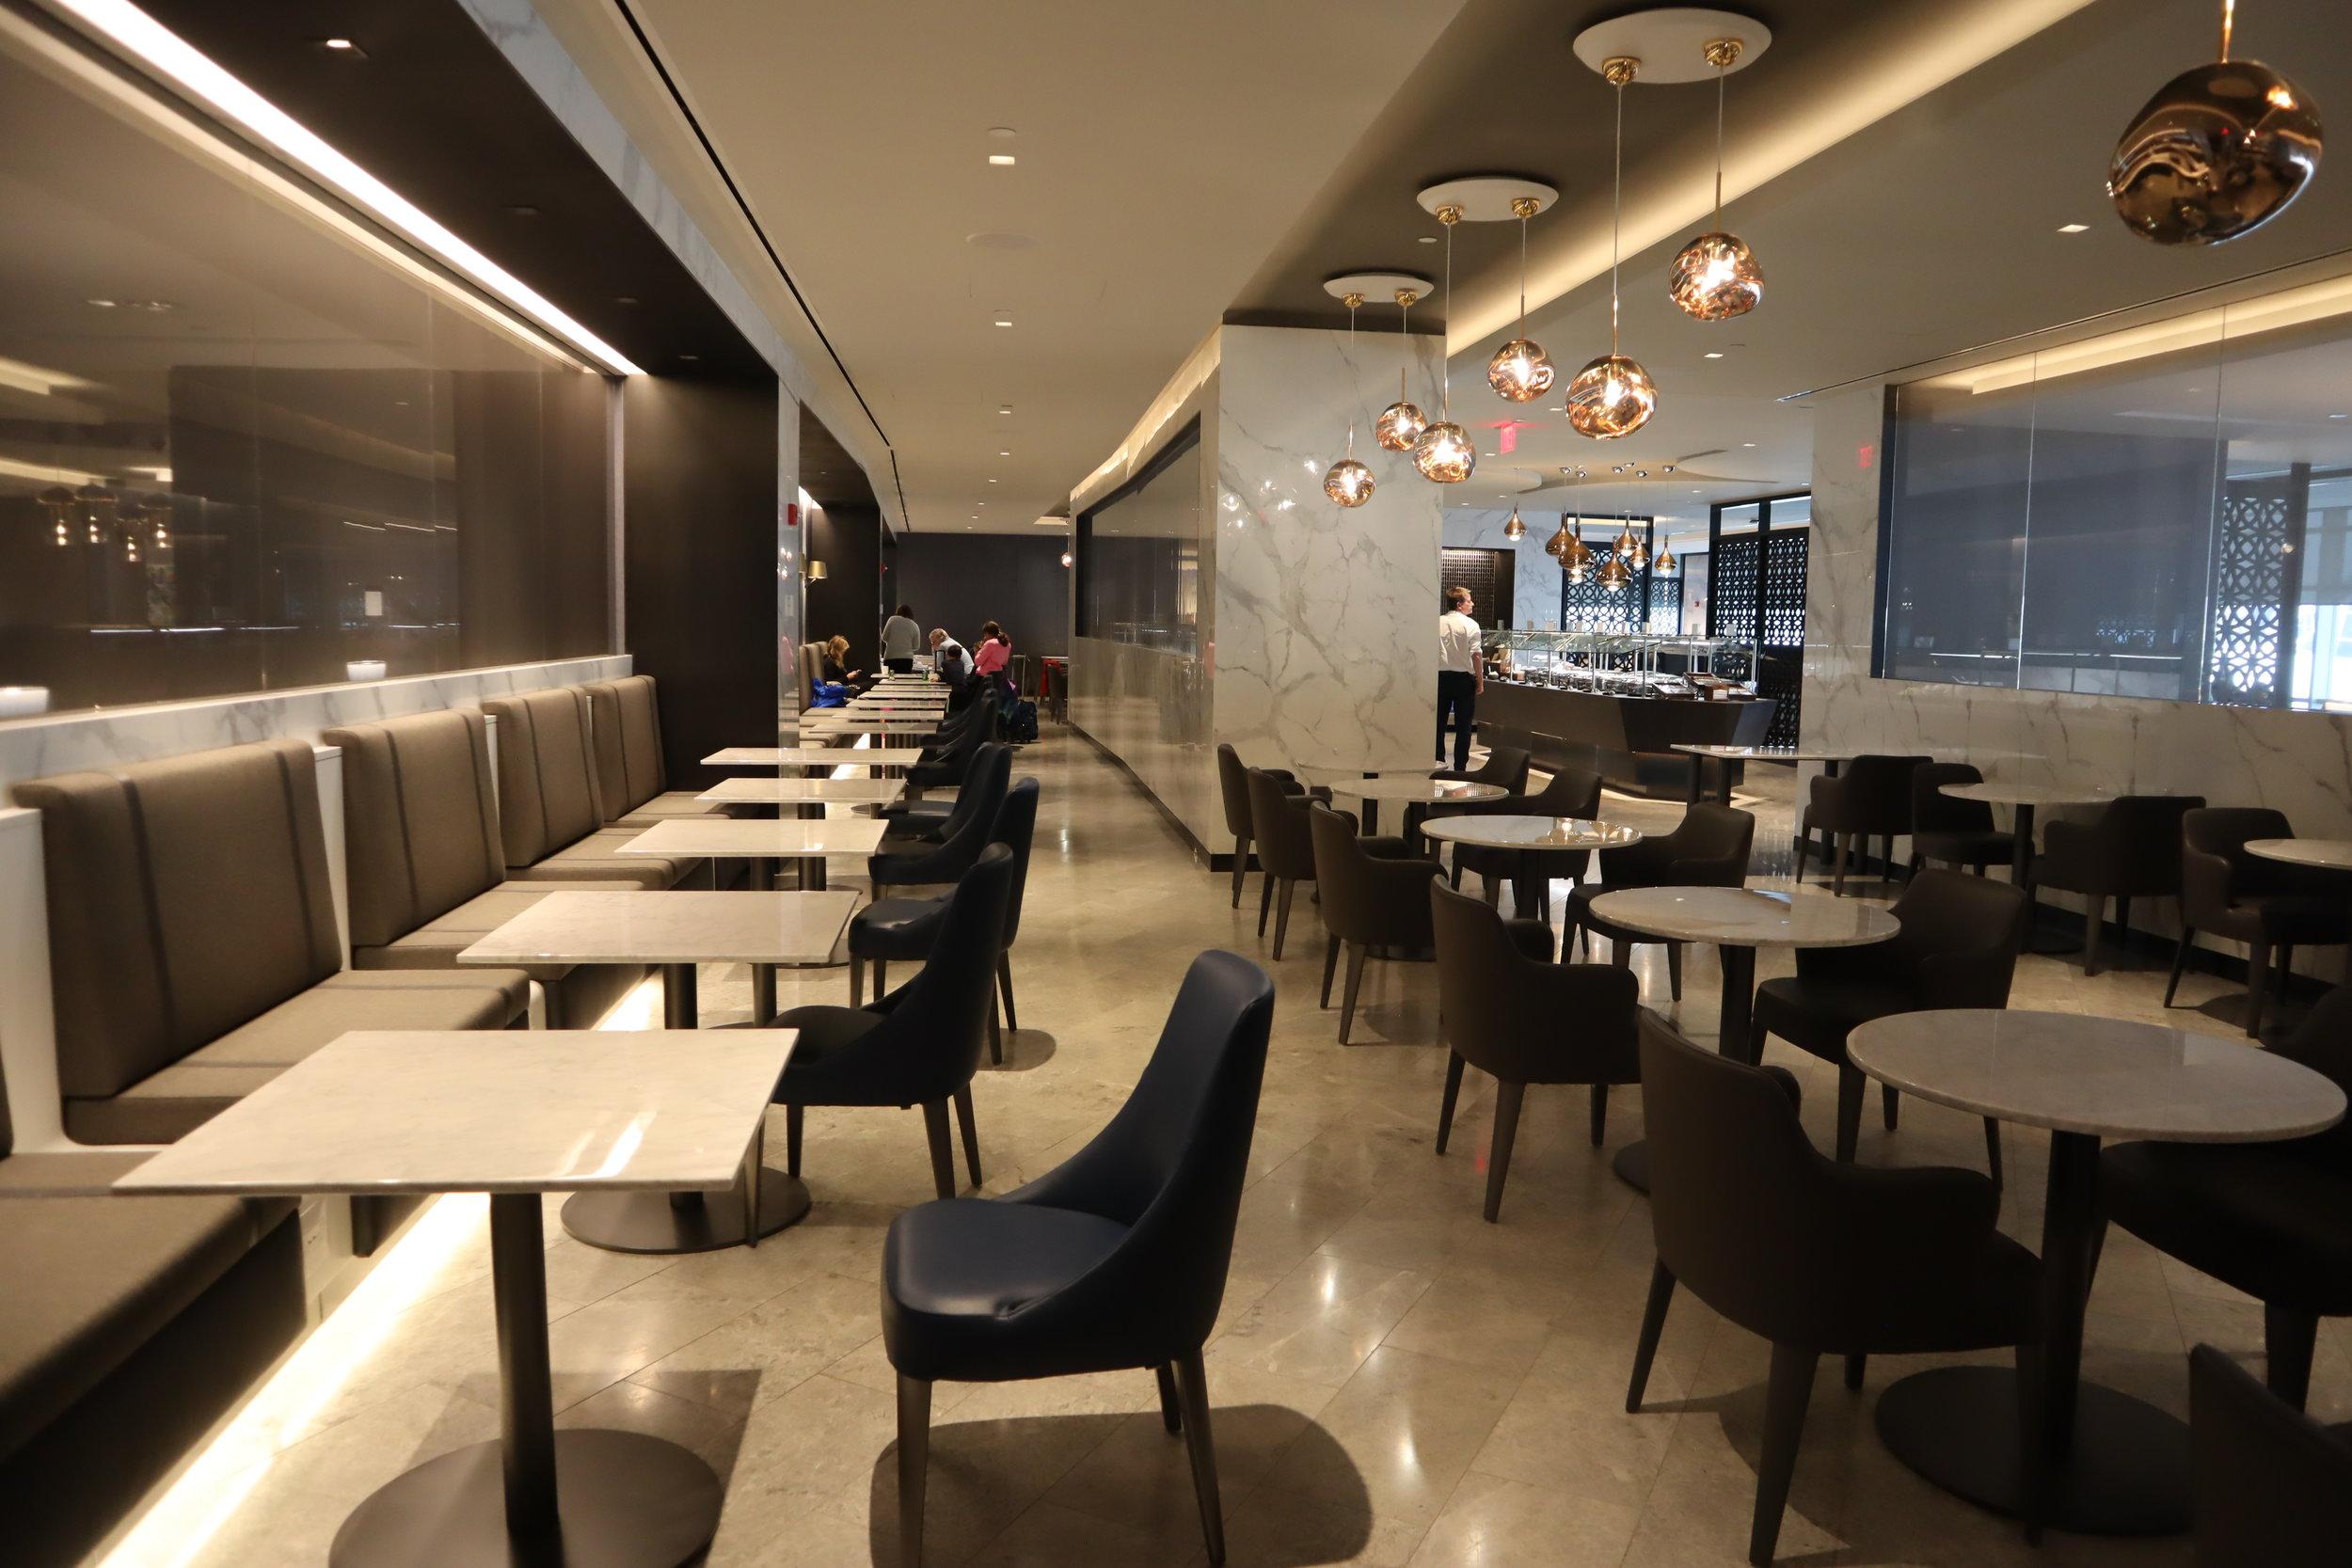 United Polaris Lounge Newark – Buffet seating area